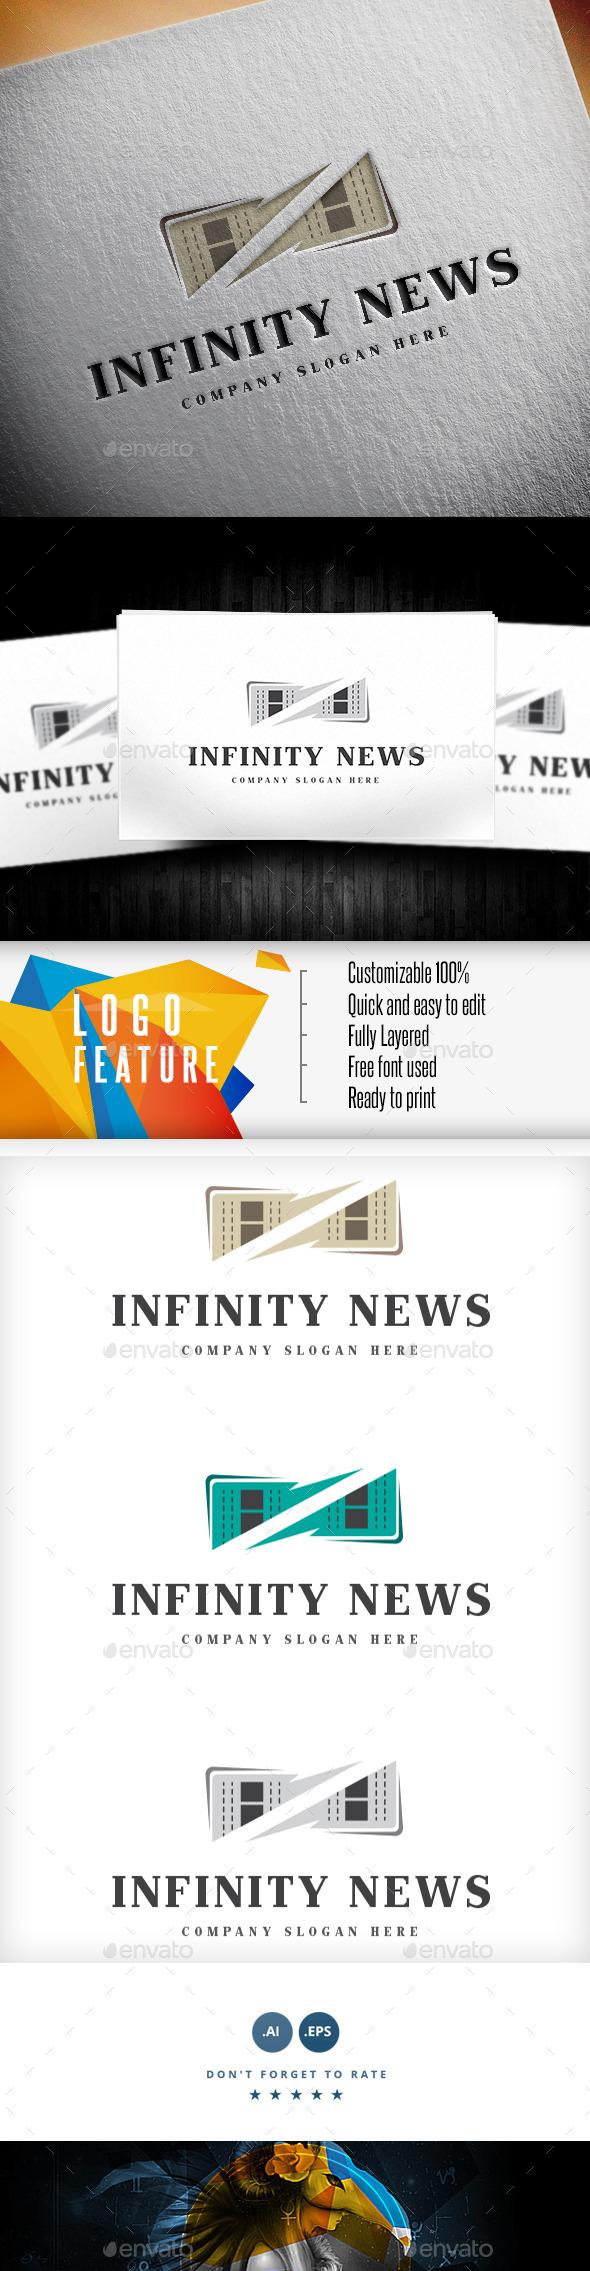 GraphicRiver Infinity News Logo 9155151